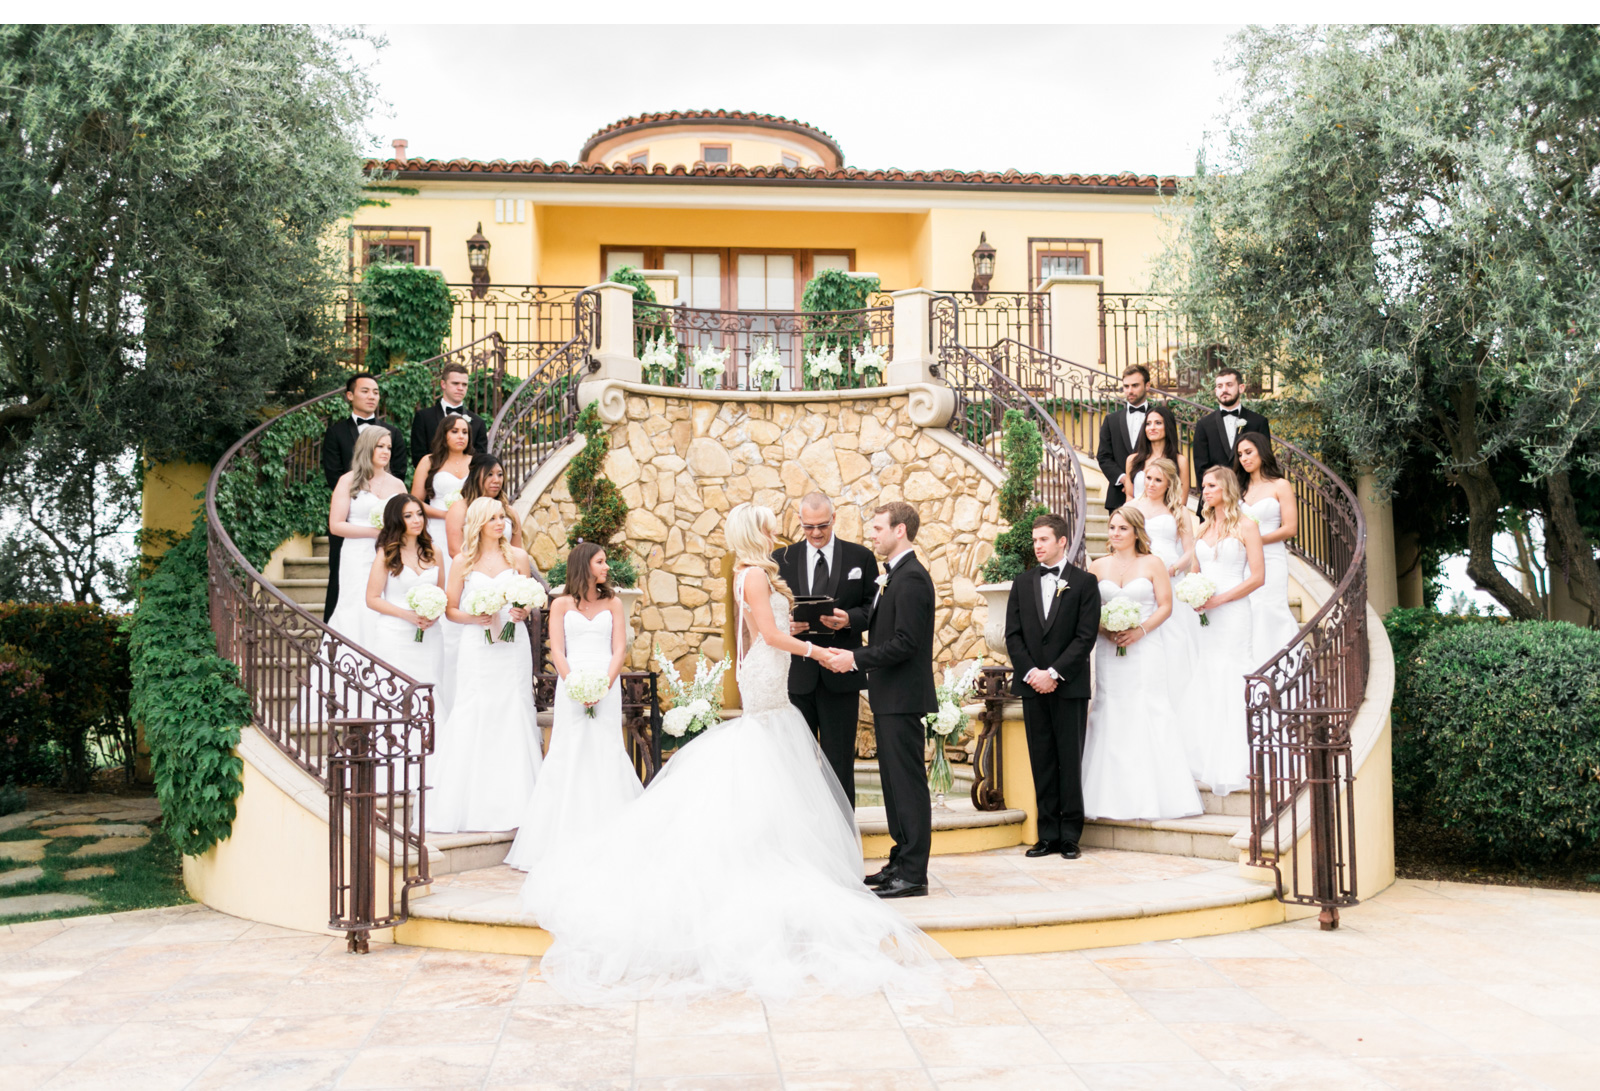 Southern-California-Wedding-Photographer-Natalie-Schutt-Photography_22.jpg